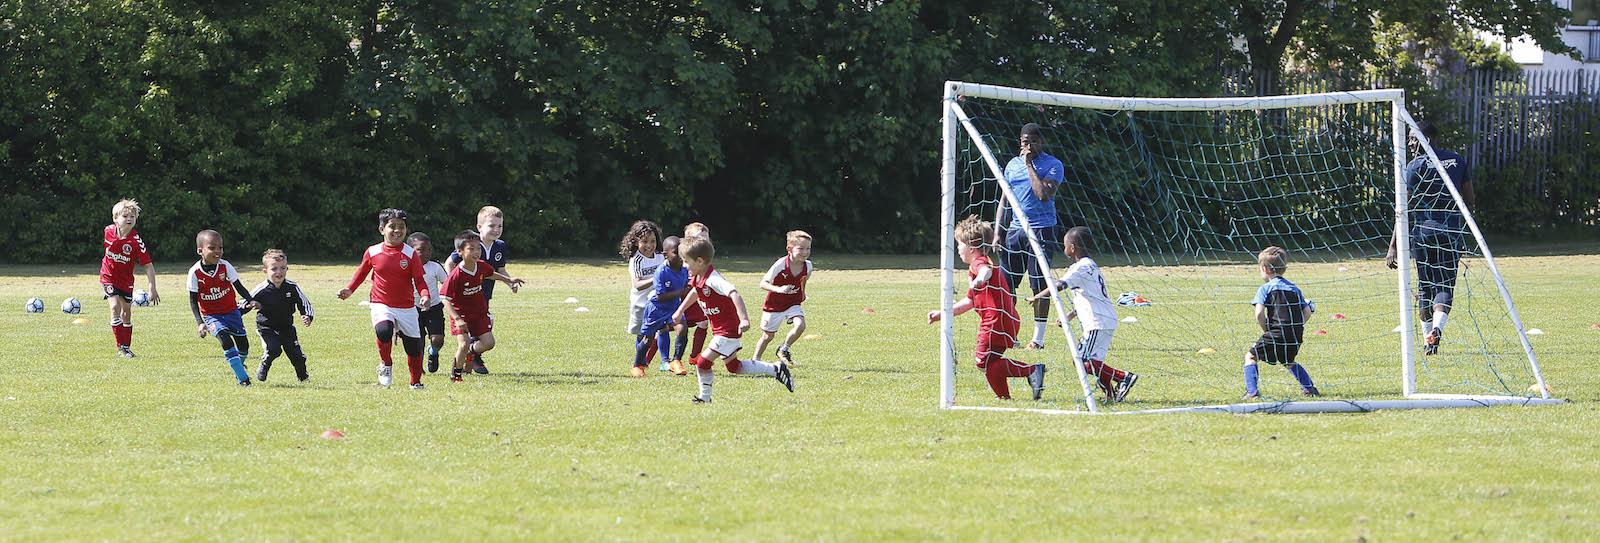 Saturday & Sunday Kids Football Coaching